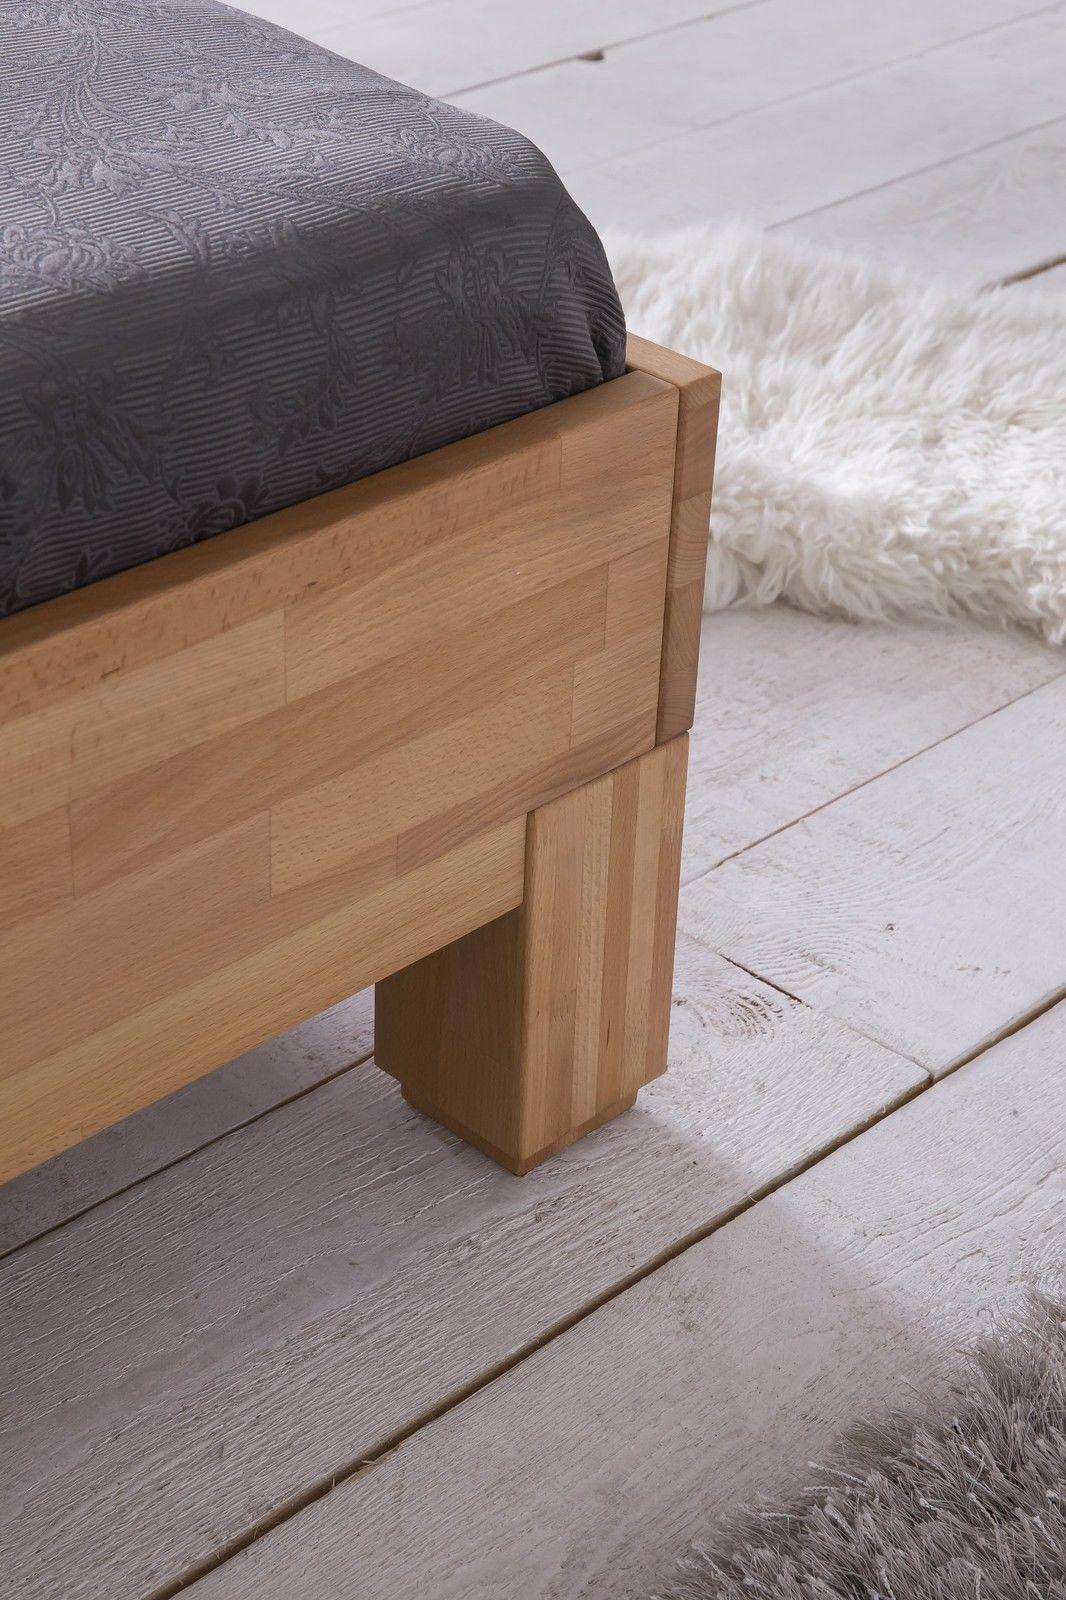 massivholzbett schlafzimmerbett ivo bett kernbuche 160x200 cm kaufen bei sylwia lesniewska. Black Bedroom Furniture Sets. Home Design Ideas